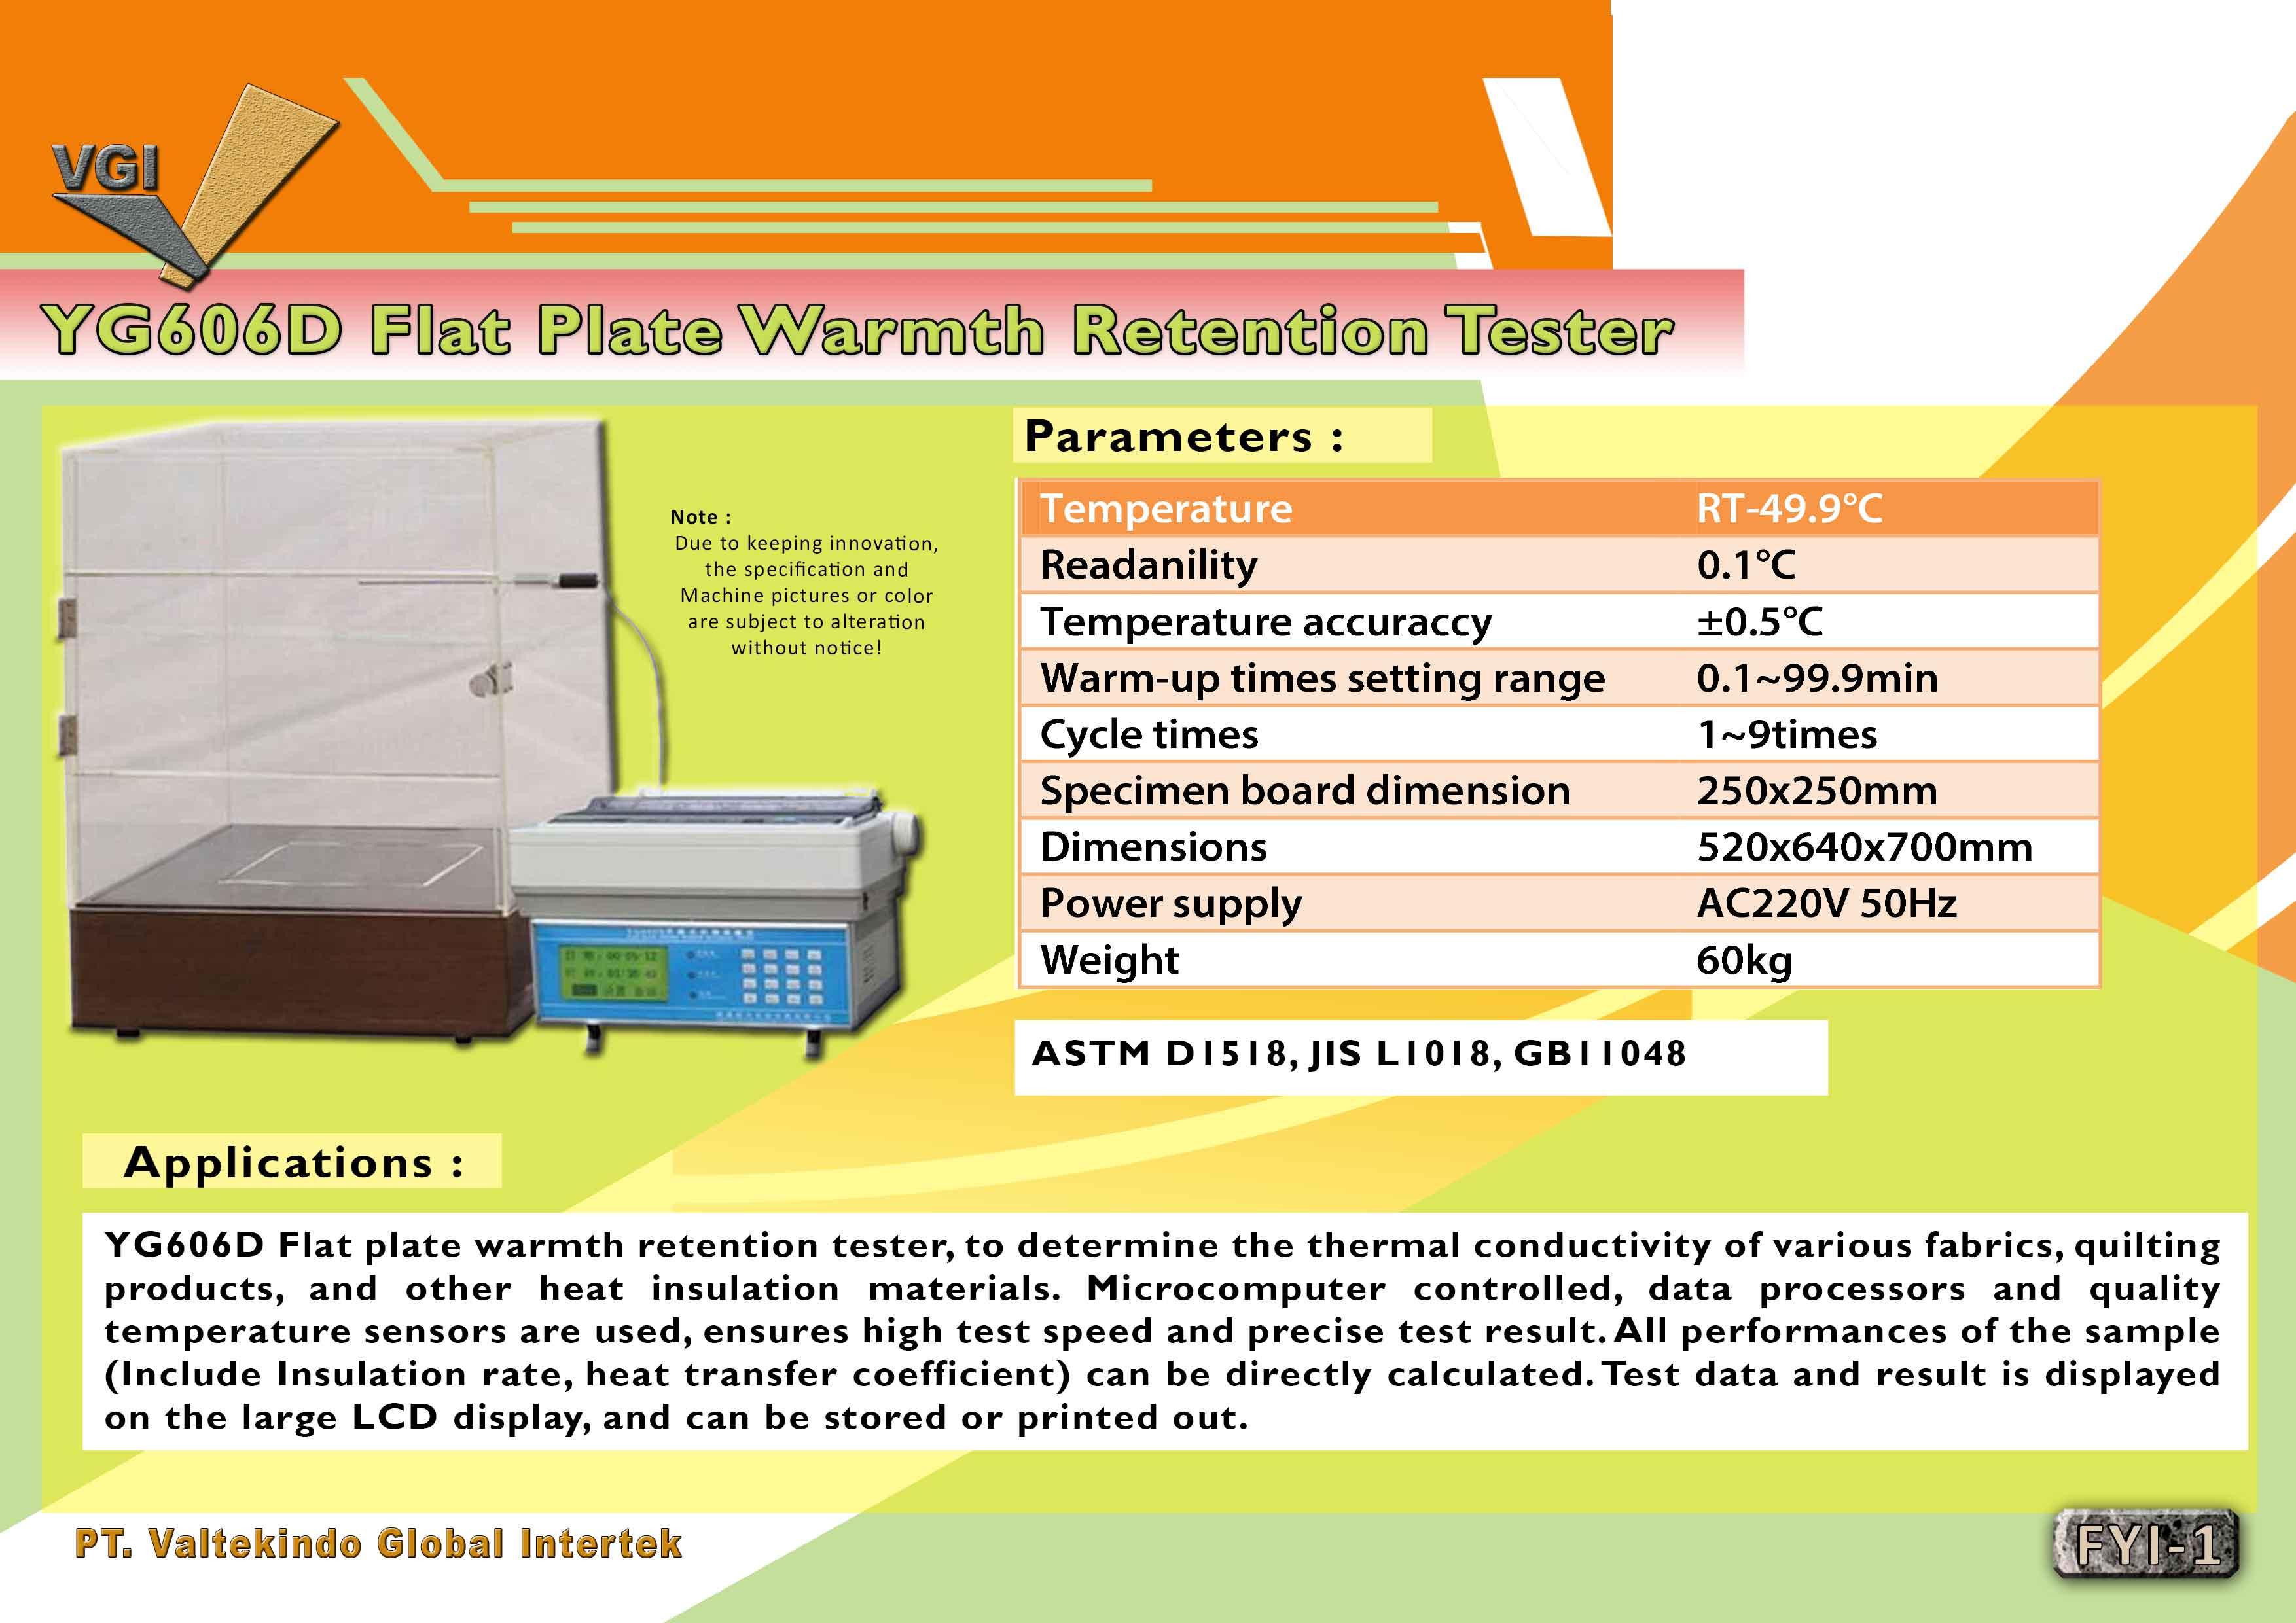 jual mesin Flat Plate Warmth Retention Tester  Flat Plate Warmth Retention Tester